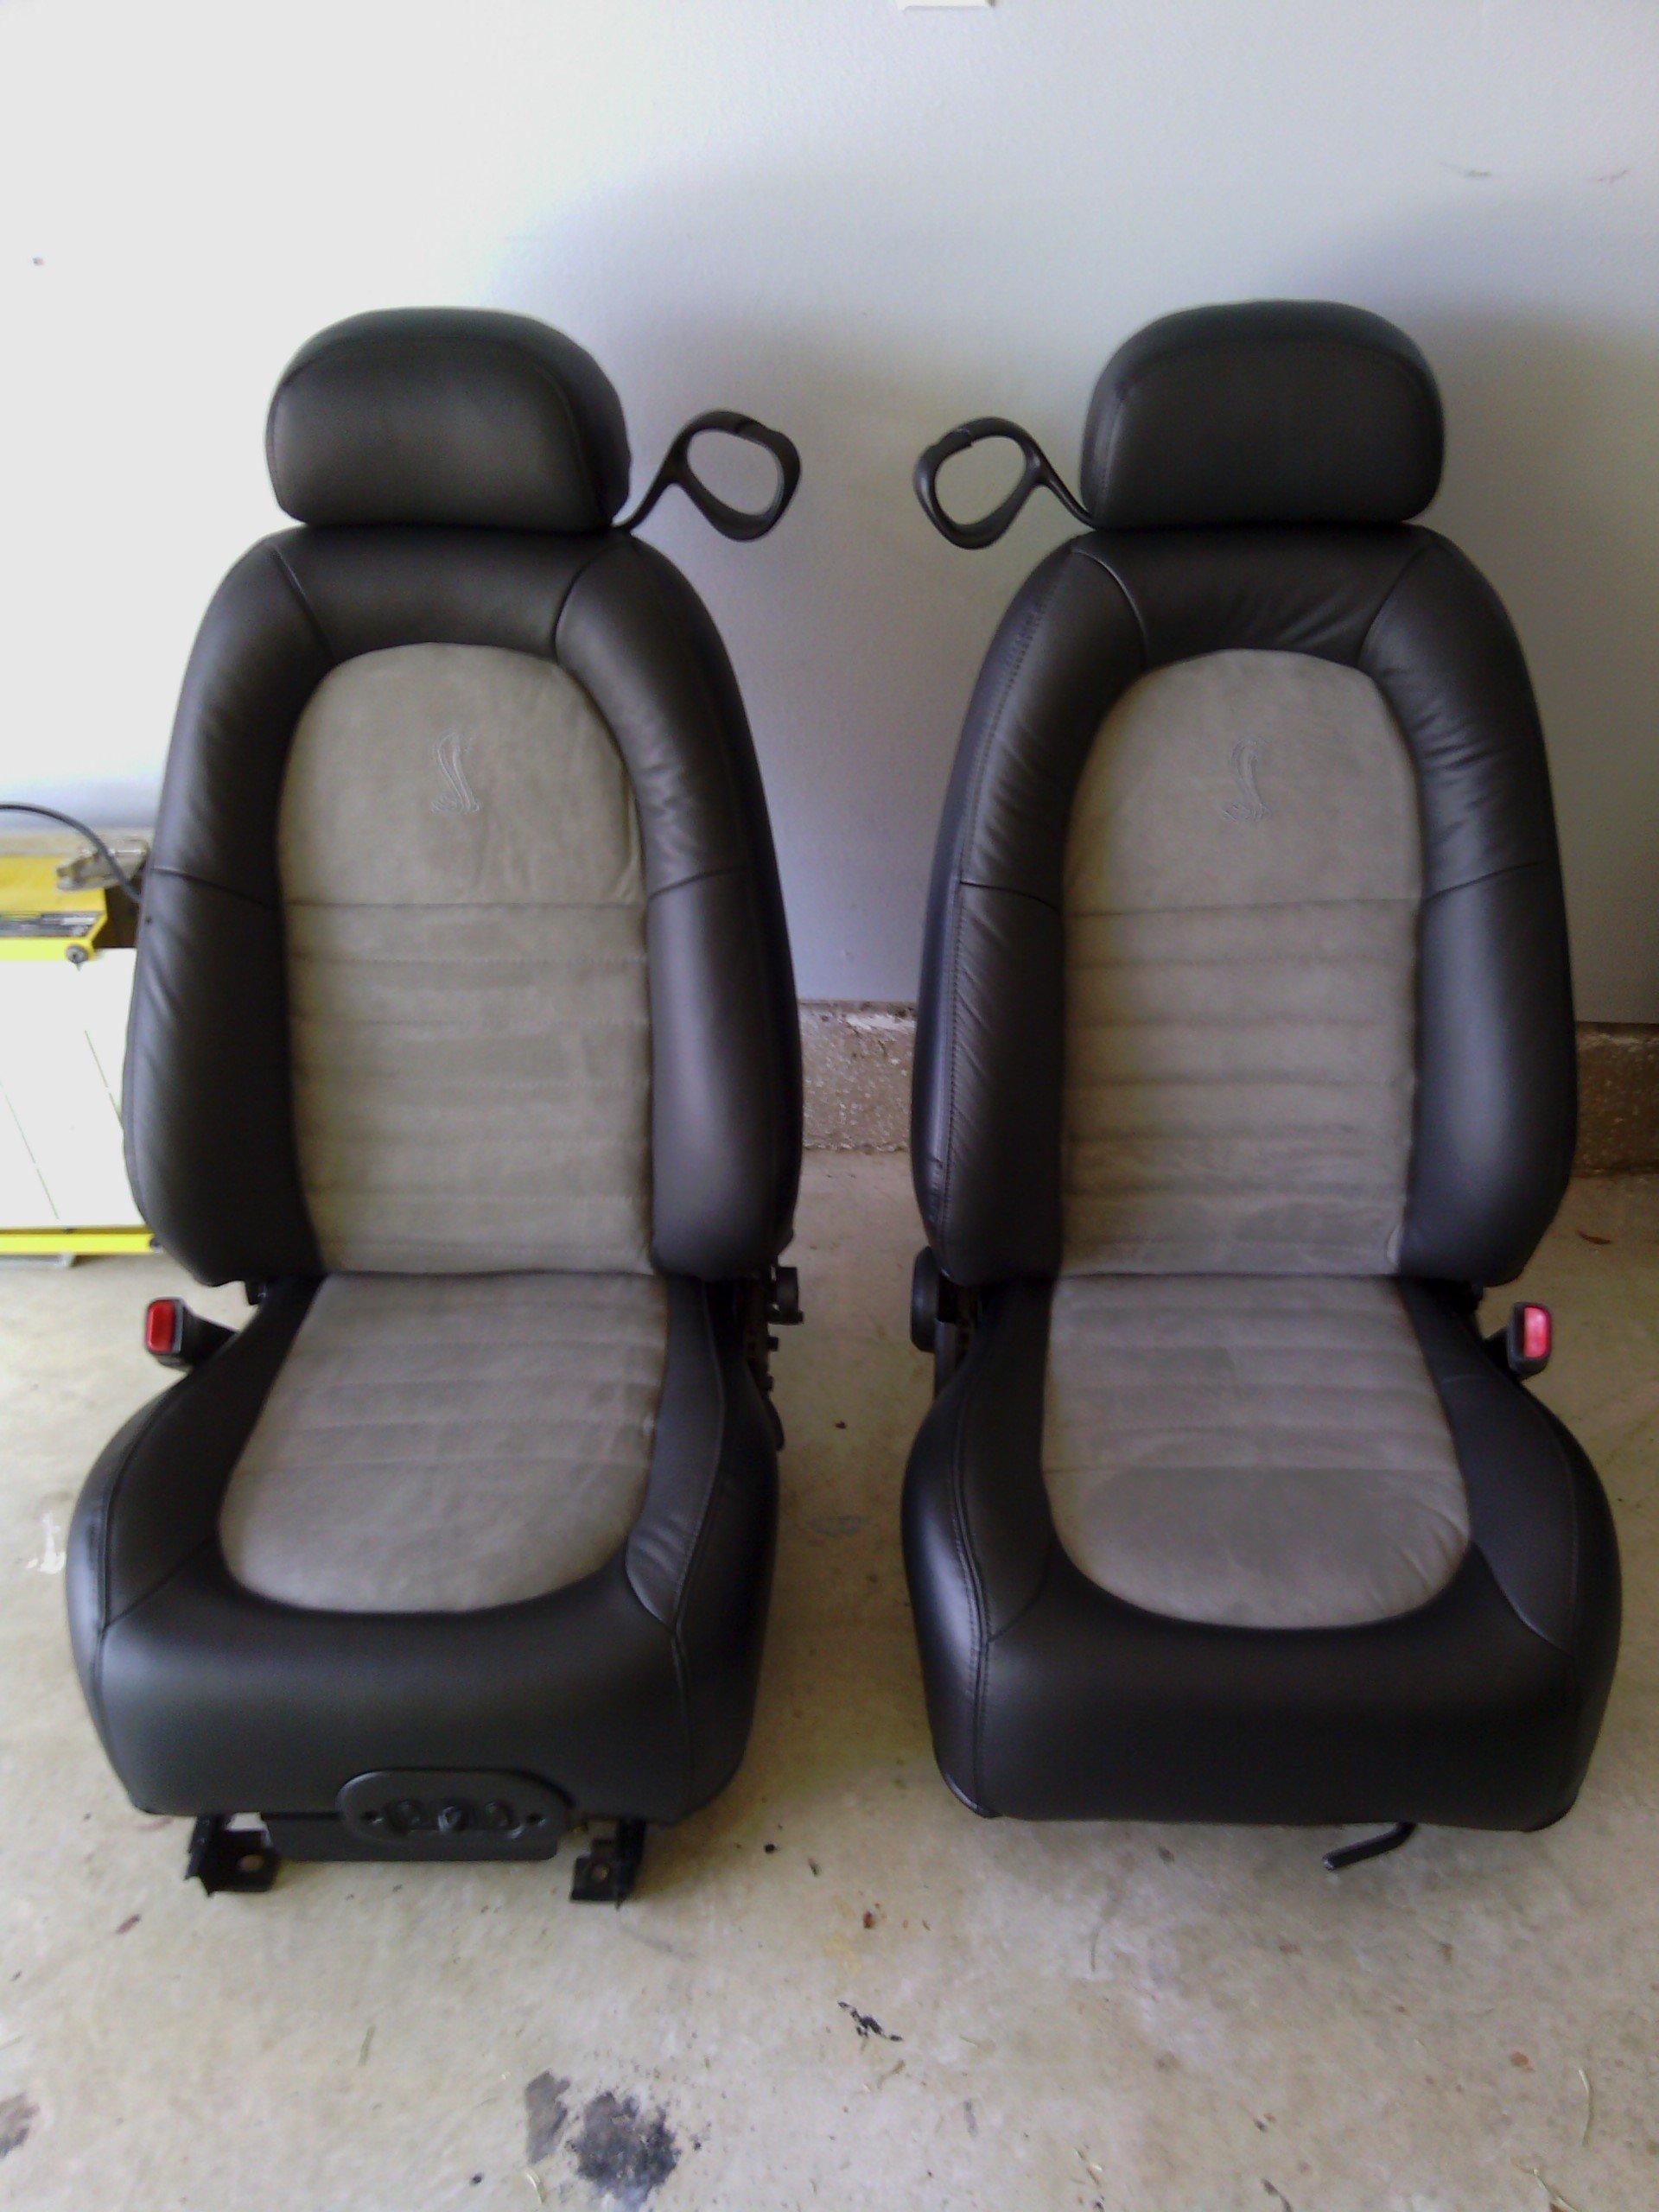 2001 Cobra Seats Alcantara Or Unisuede Img 20170721 111039 Jpg